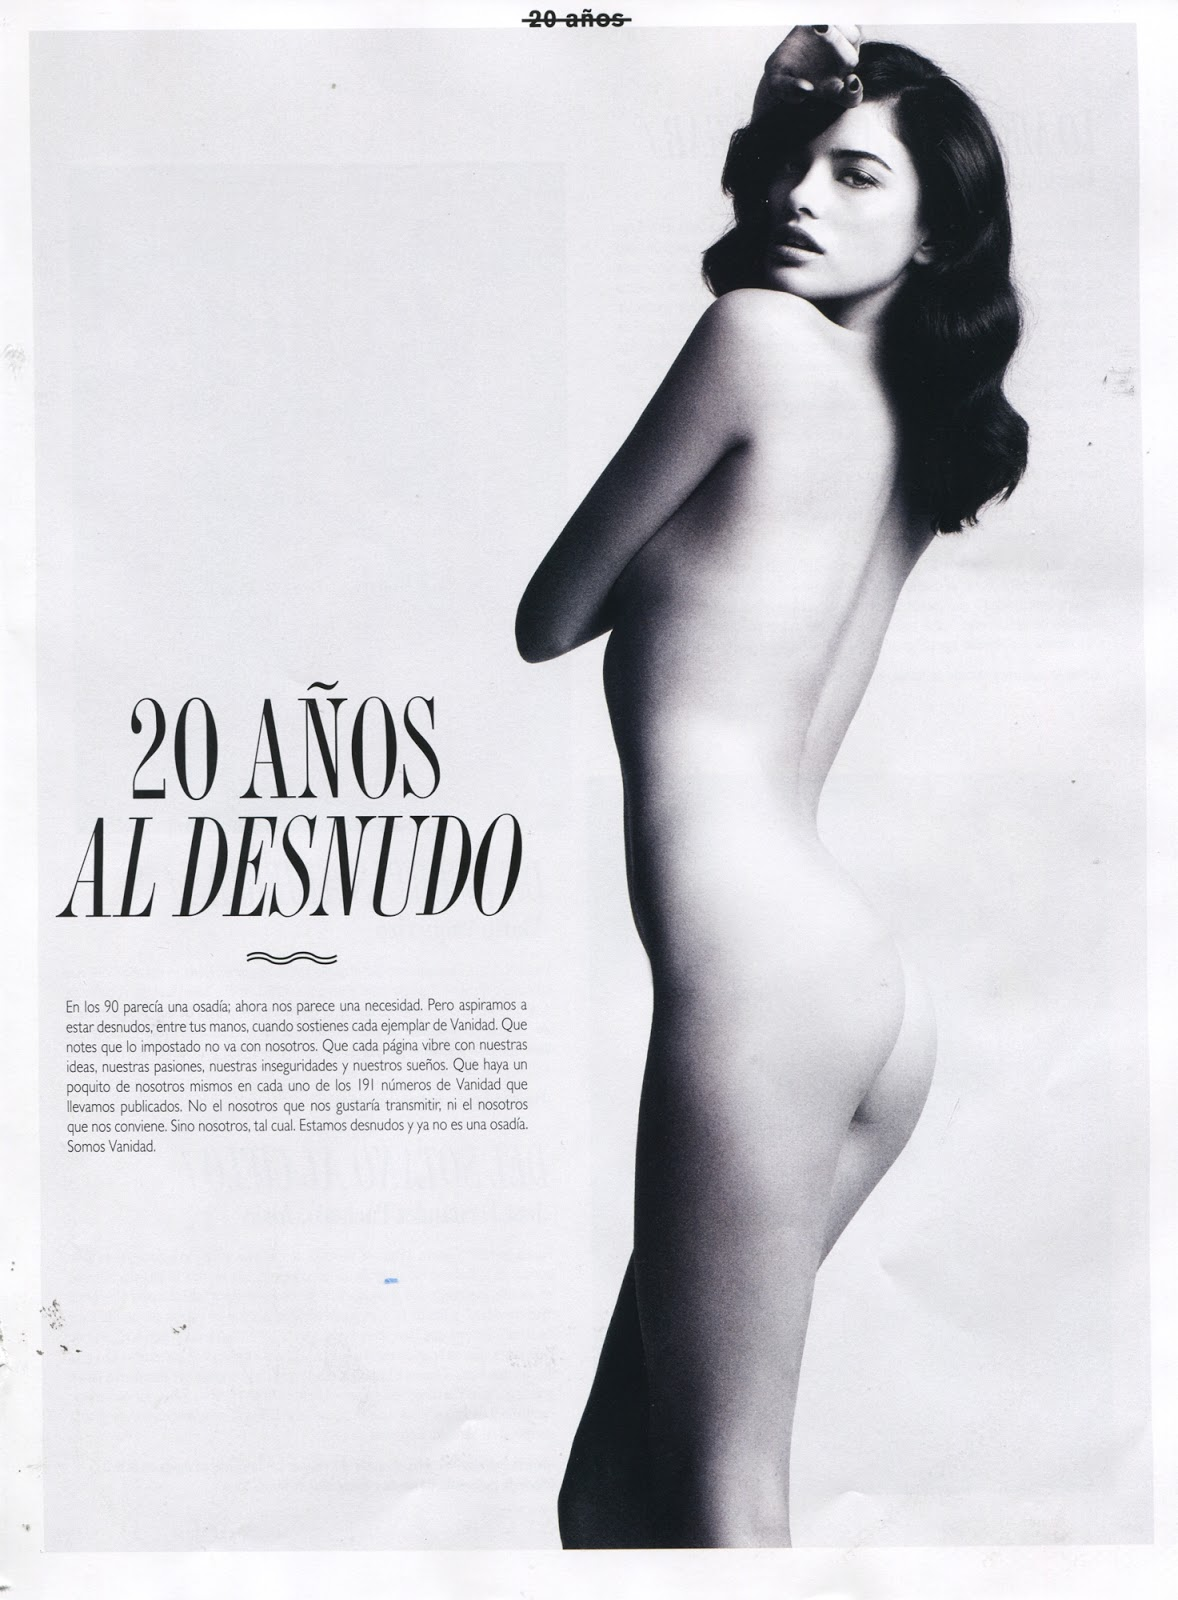 Alejandra alonso nude - 2019 year